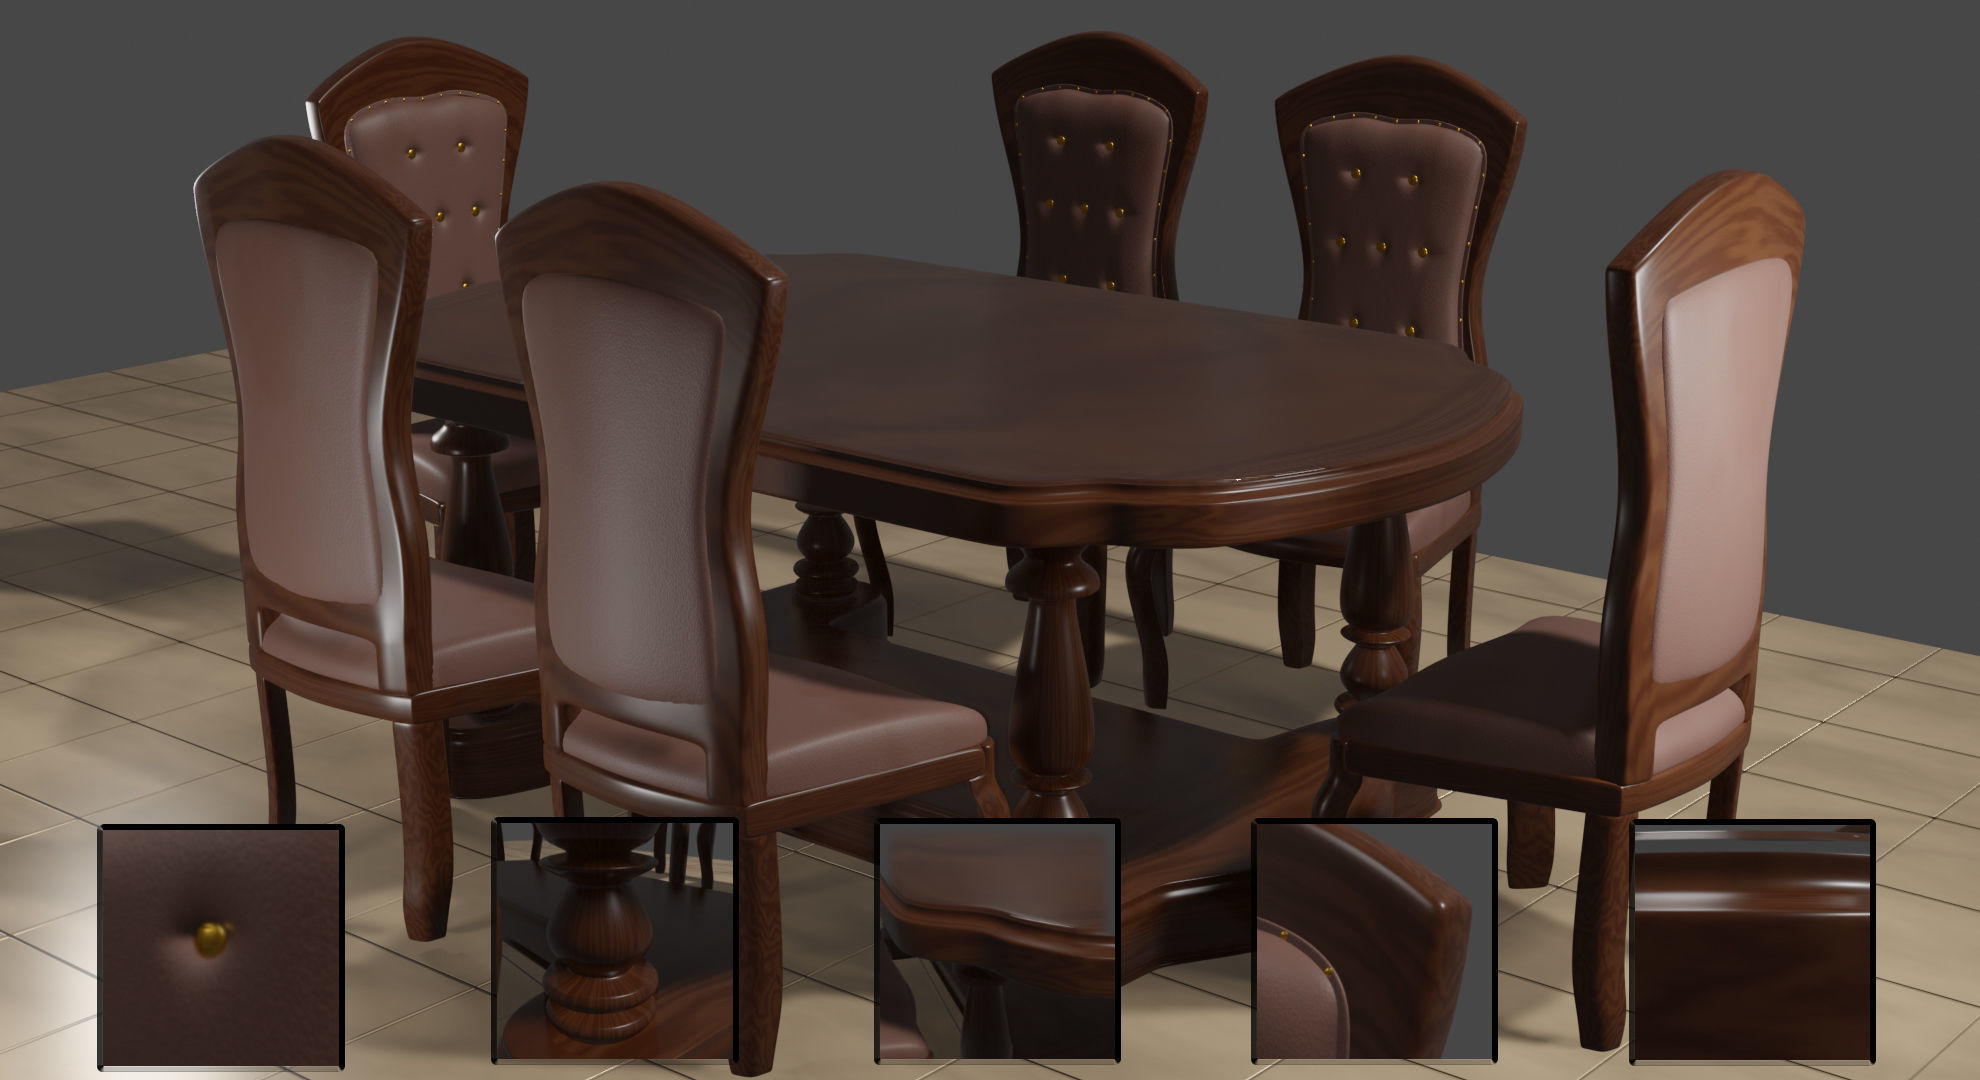 Dining Table - Indonesian teak wood 3D model | CGTrader